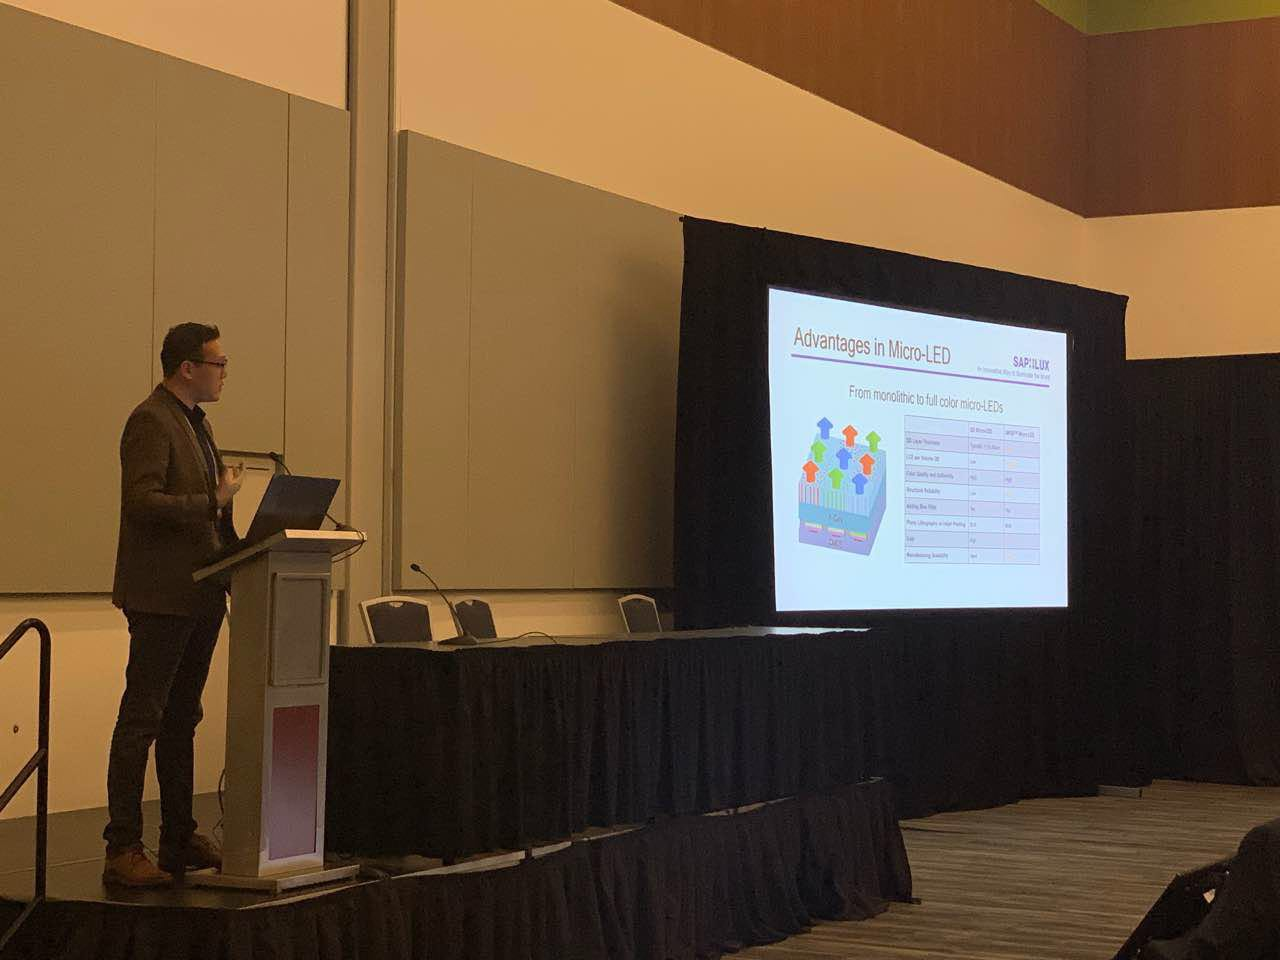 NPQD技术全球首发,赛富乐斯有望解决Micro-LED市场化核心难题